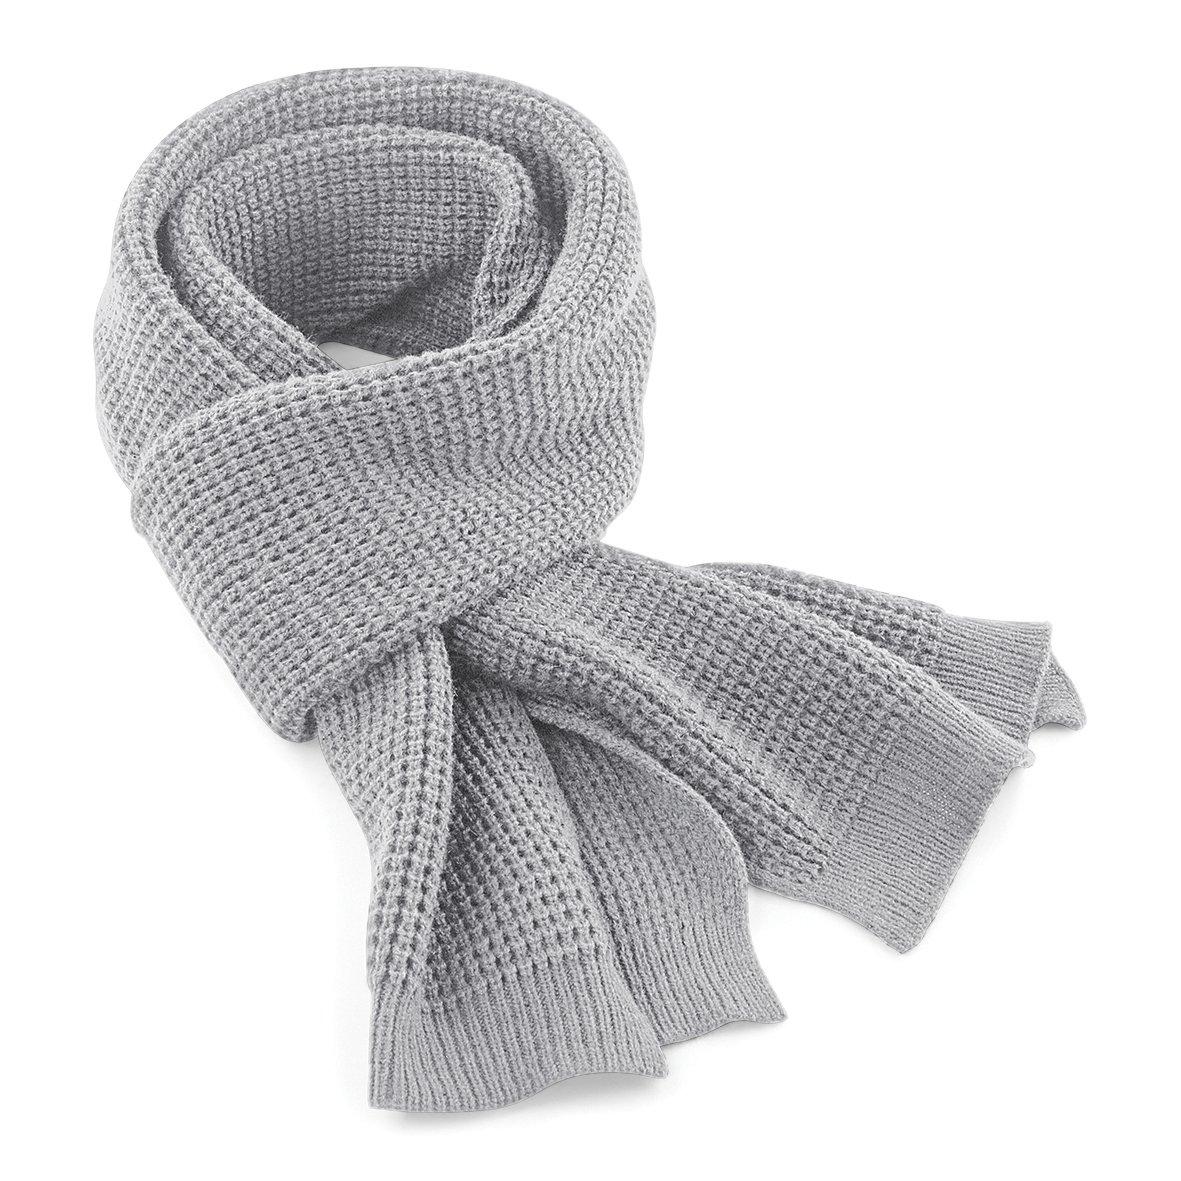 Beechfield Unisex Classic Waffle Knit Winter Scarf (One Size) (French Navy) UTRW3665_2